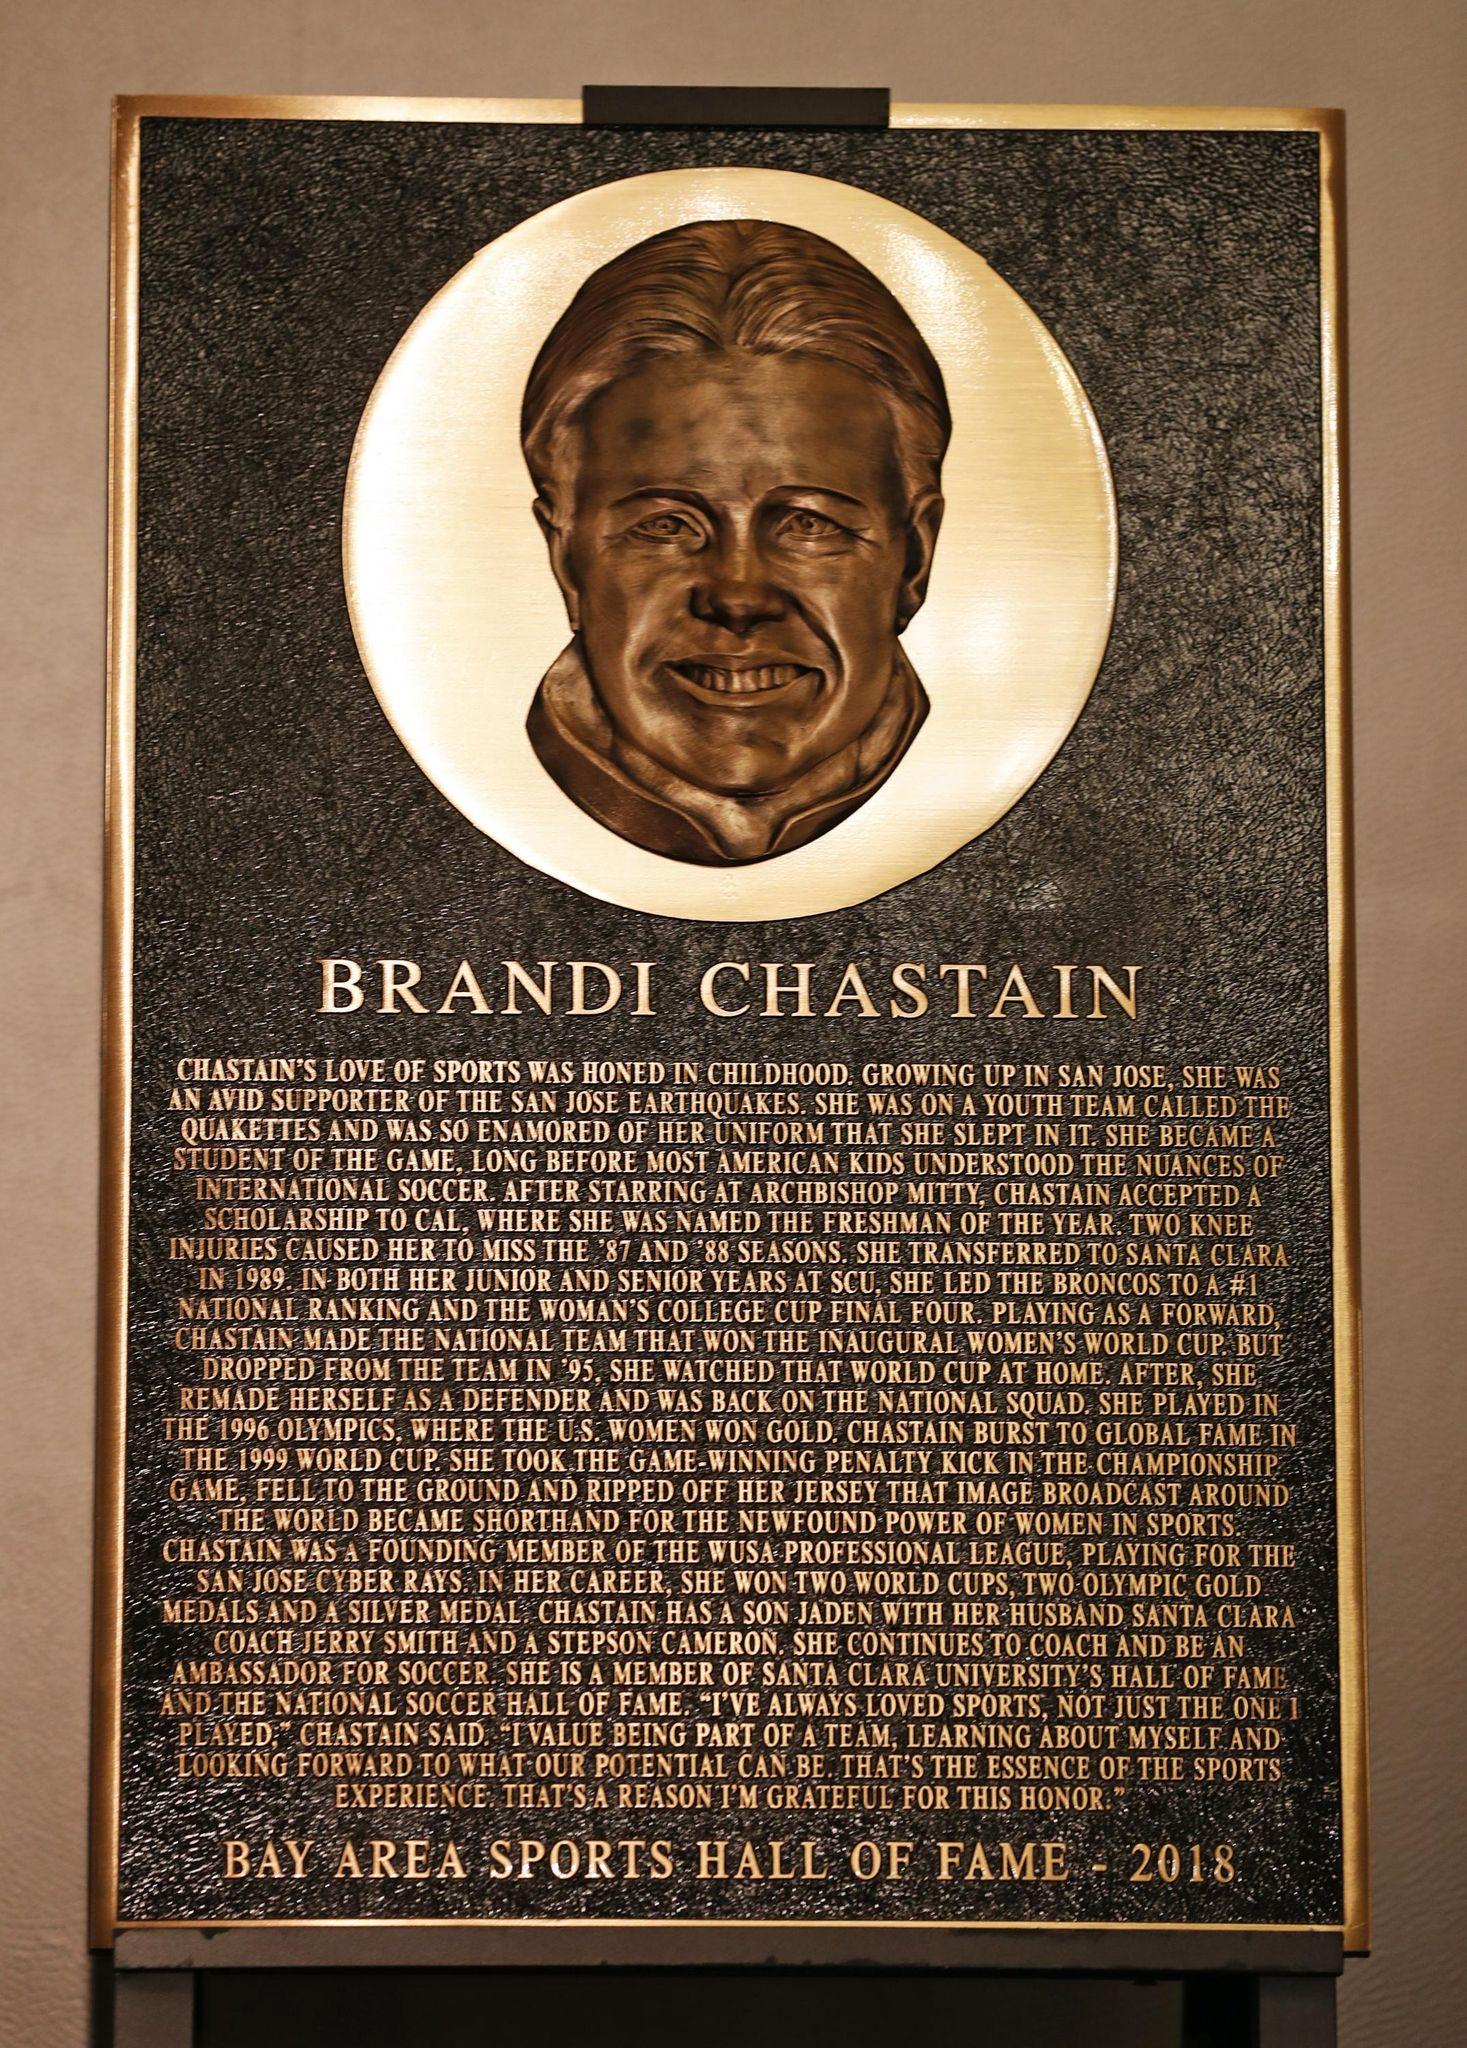 Brandi_chastain_plaque_11014_s1467x2048